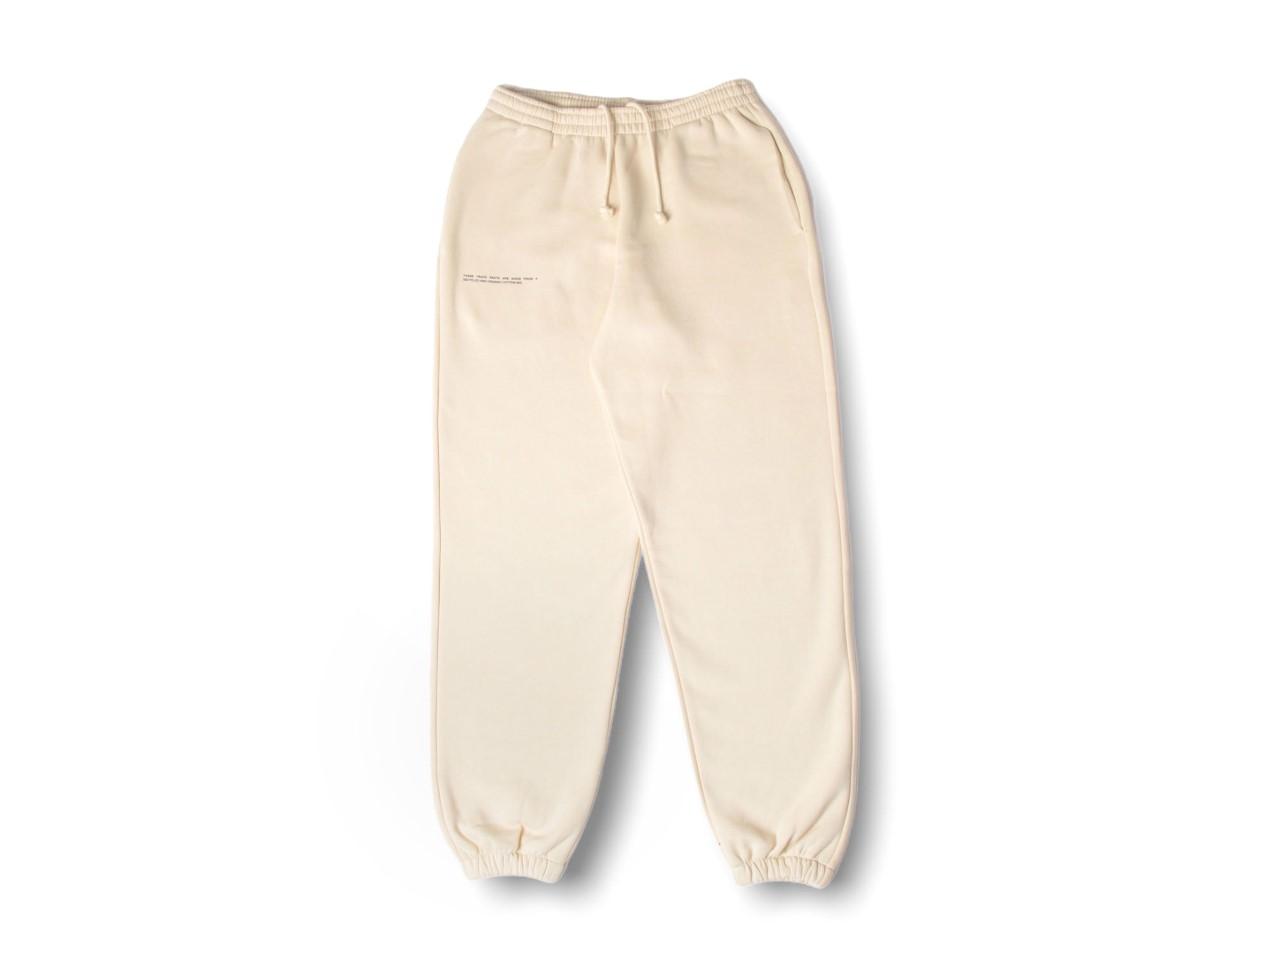 slide 1 - Cotton Track Pants - Sand